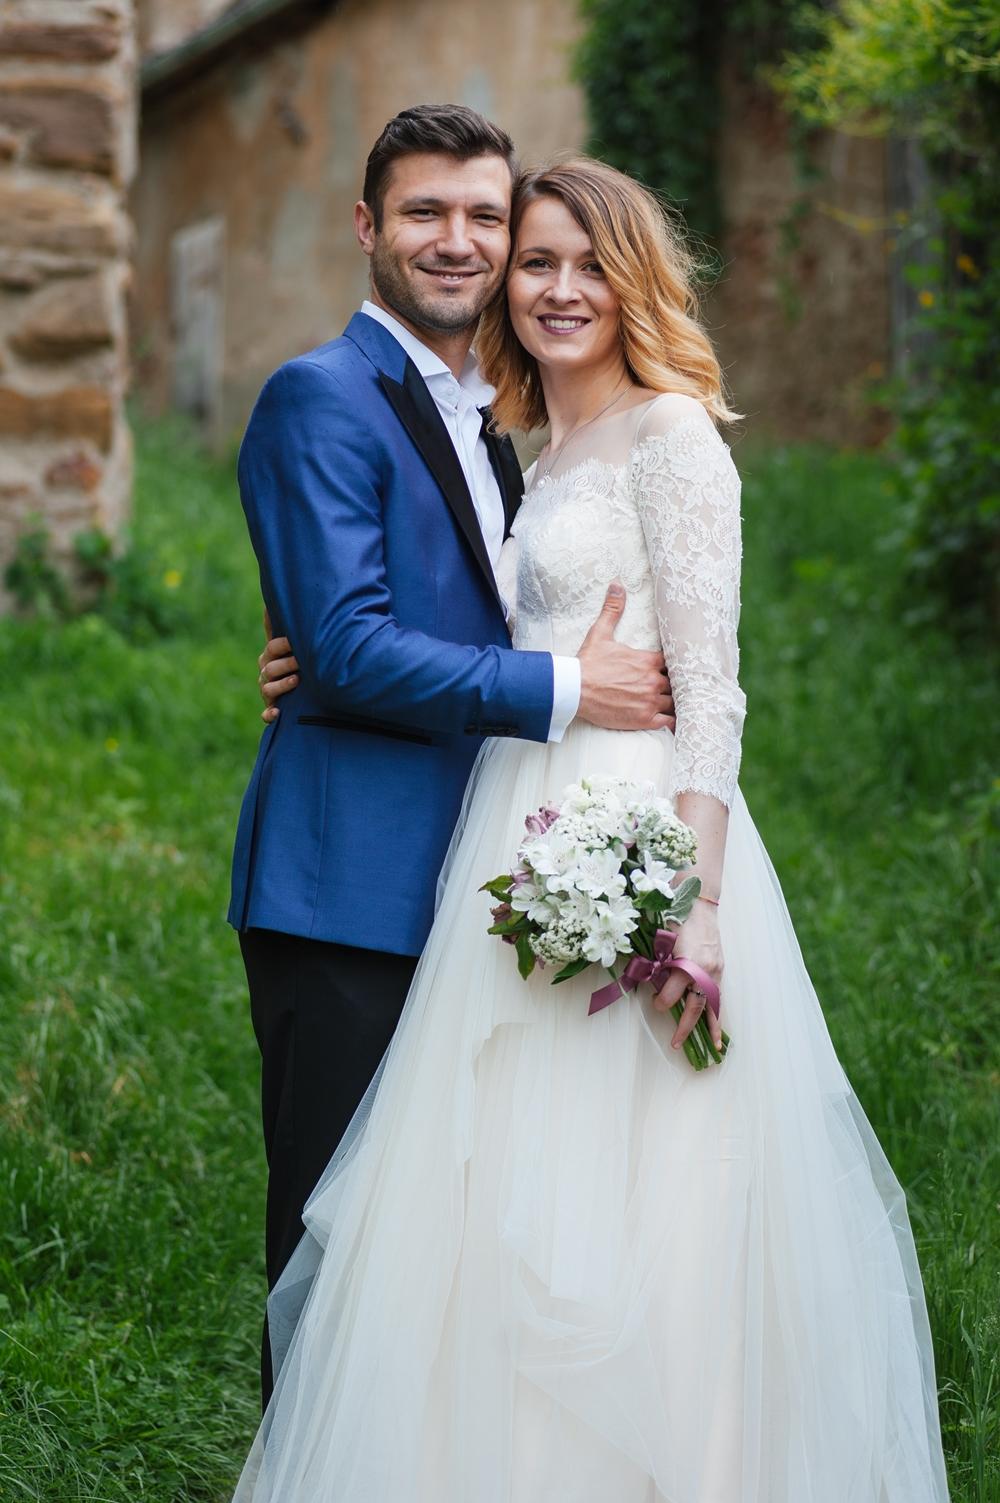 Fotograf profesionist de nunta, fotograf, fotograf de nunta, fotograf profesionist,,trash the dress, sedinta foto after wedding, portret miri